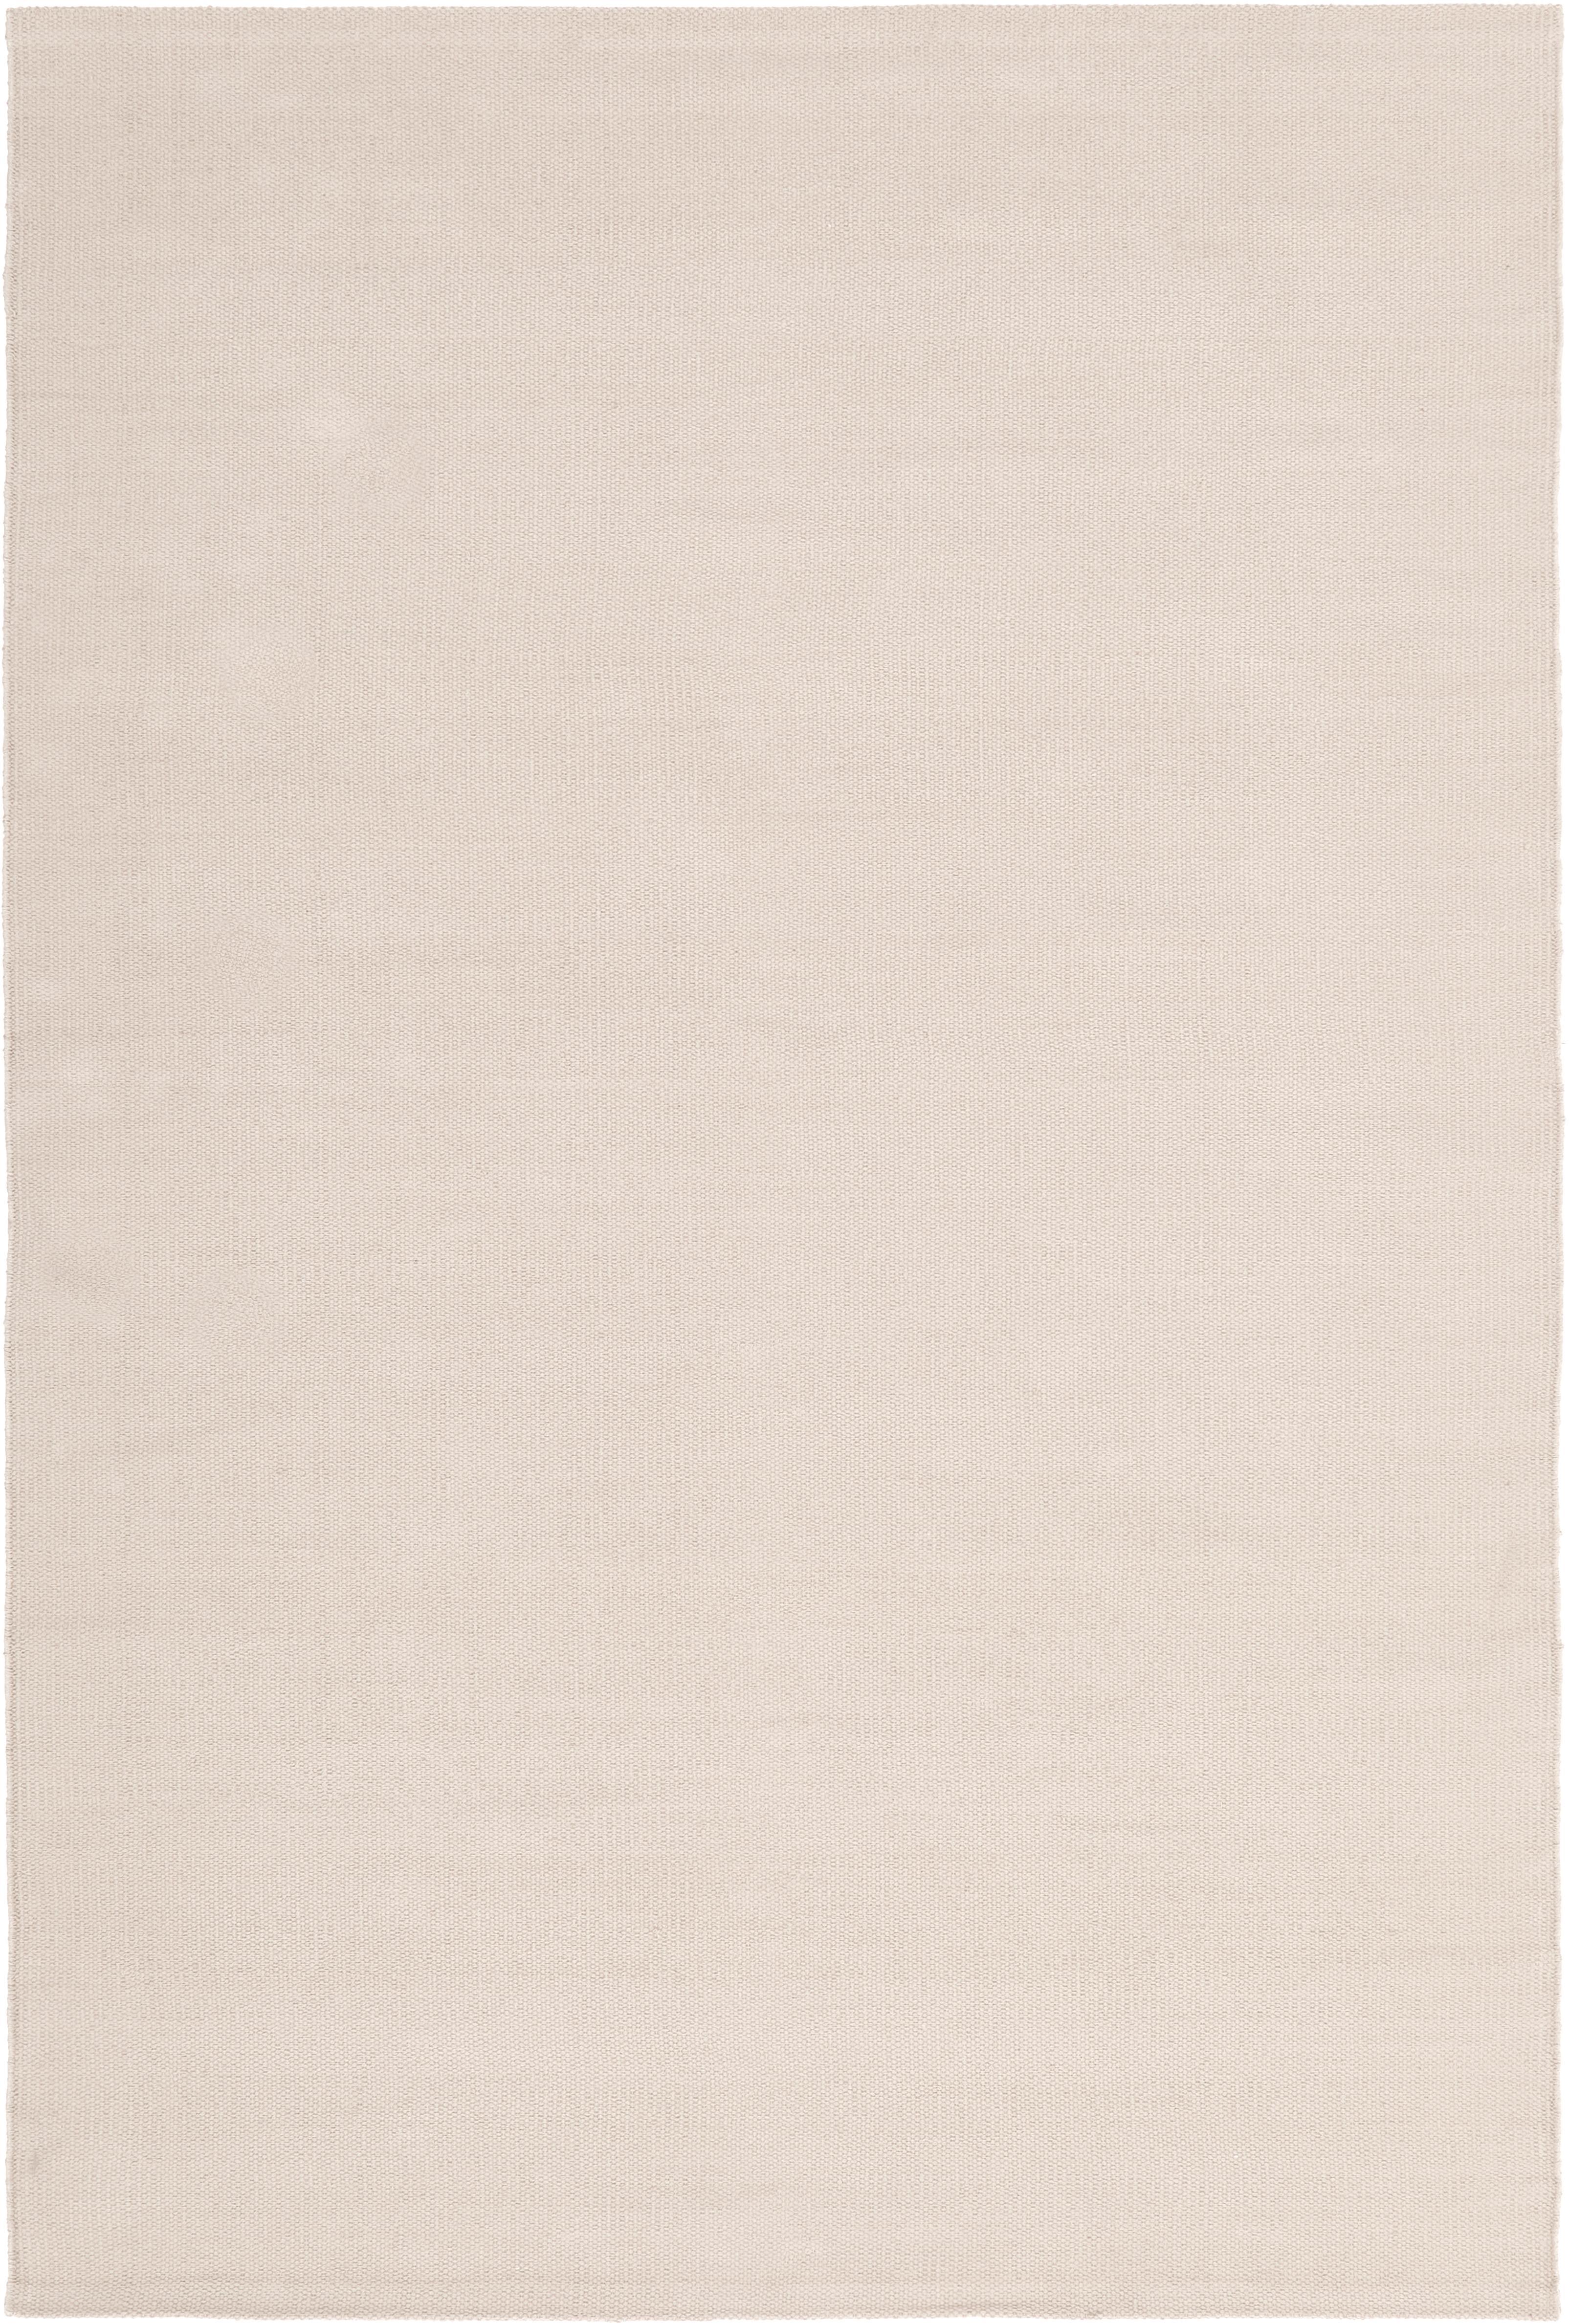 Alfombra artesanal de algodón Agneta, 100%algodón, Gris pardo, An 200 x L 300  cm(Tamaño L)